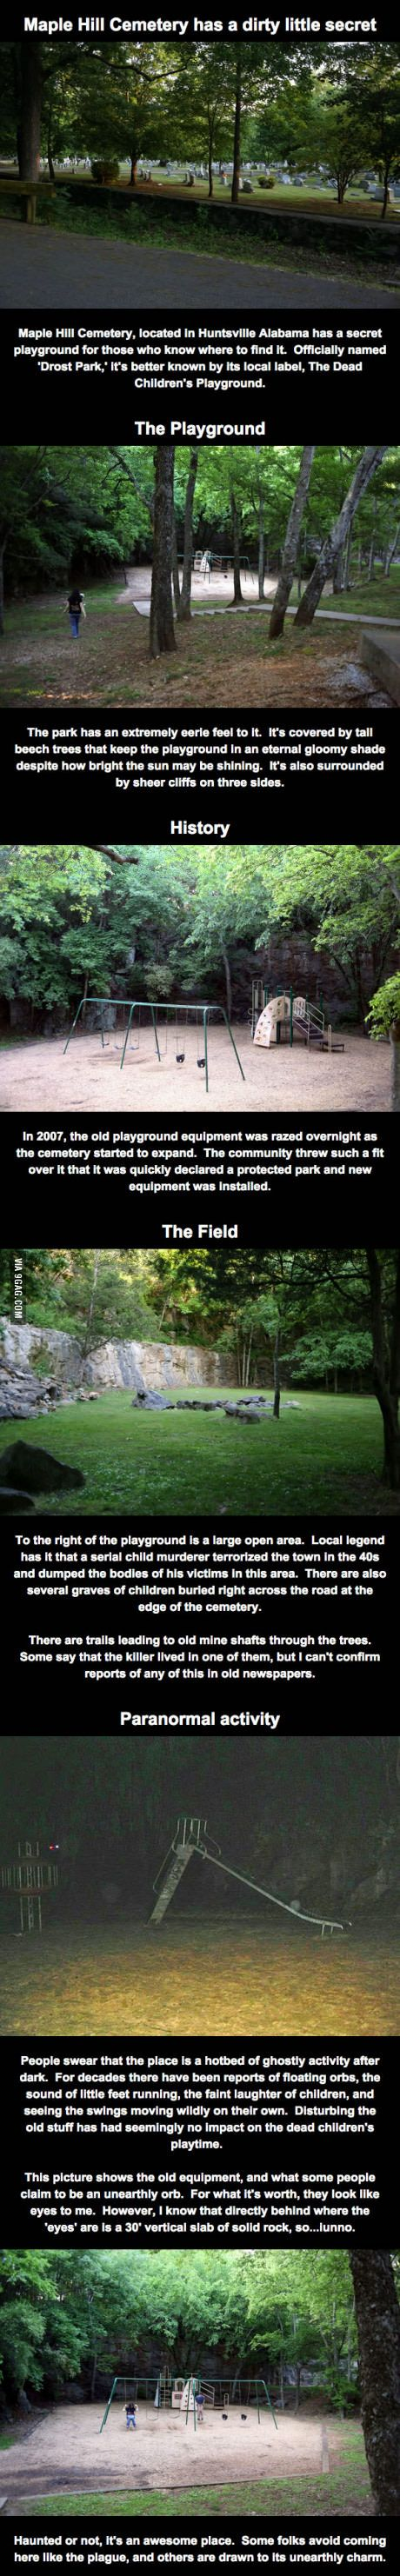 The Dead Children's Playground.                                                                                                                                                                                 More